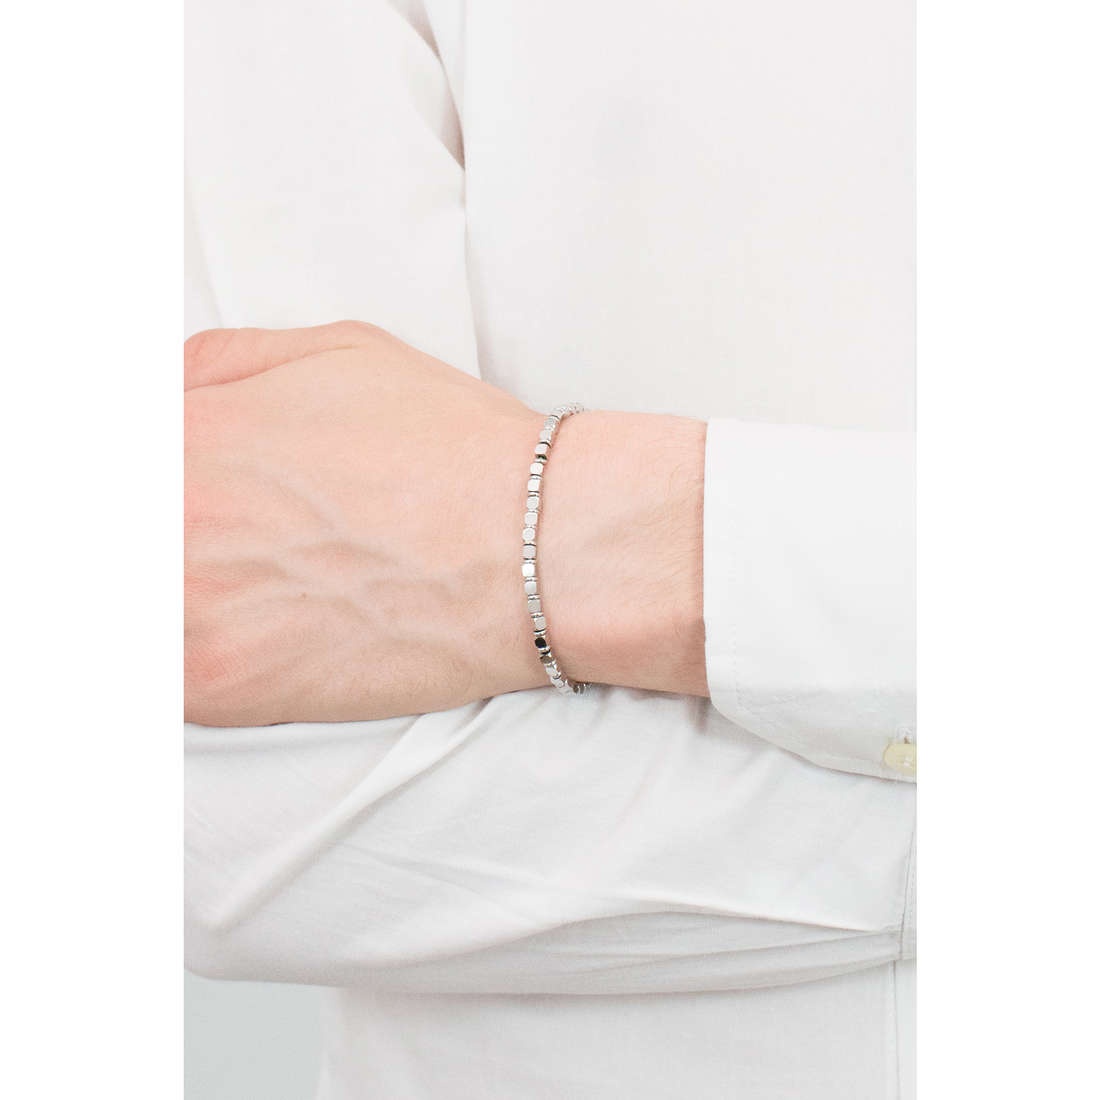 Morellato bracciali Ematite uomo SAHT04 indosso